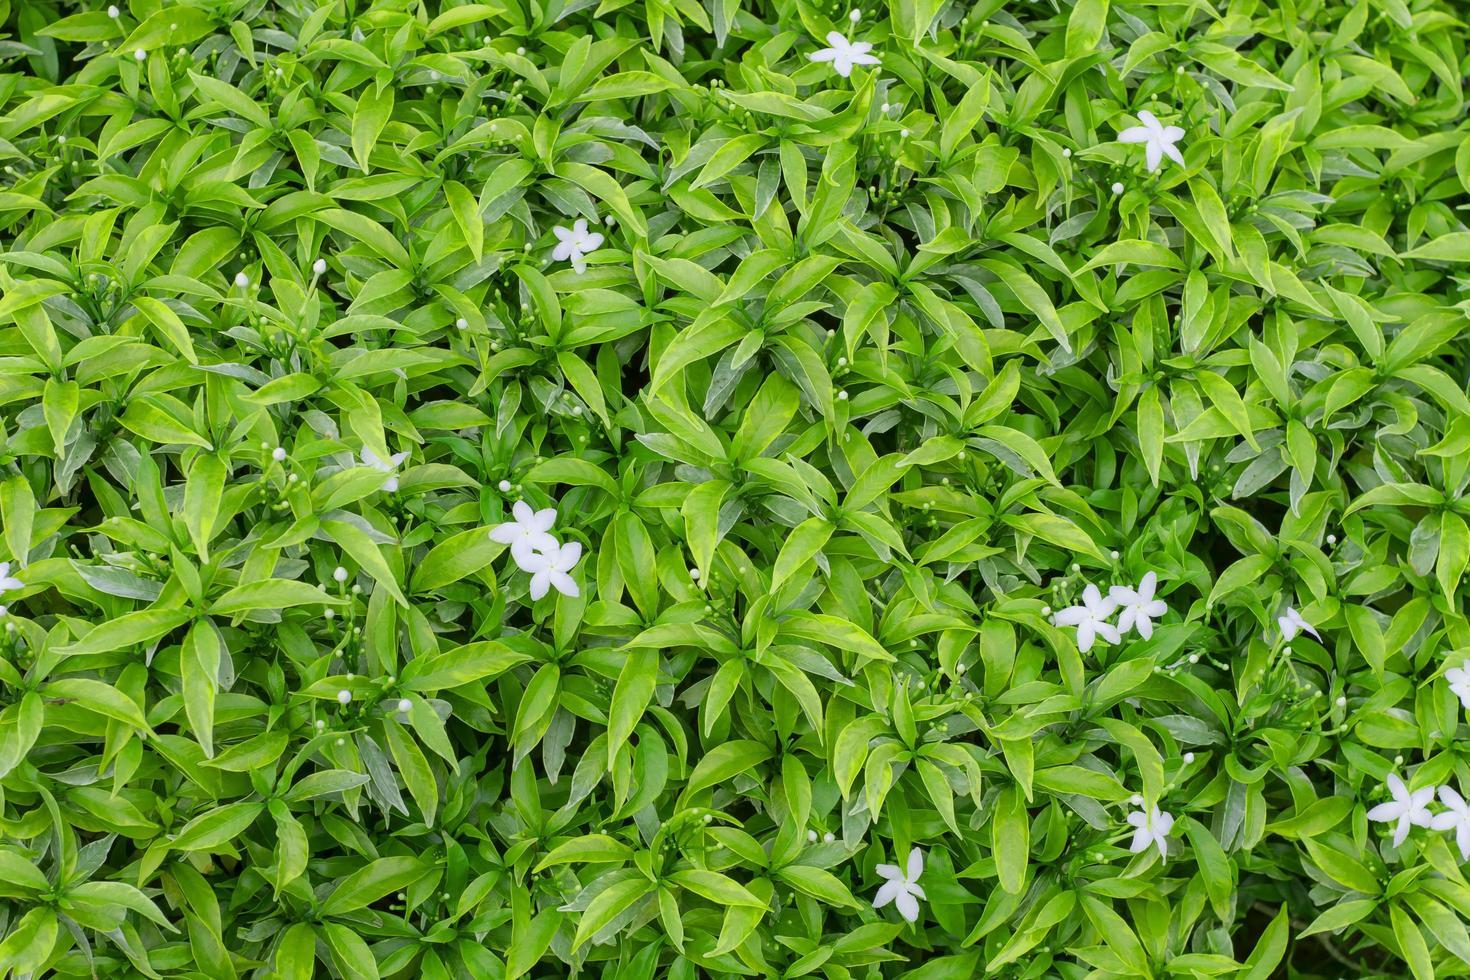 grönt blad bakgrund konsistens foto